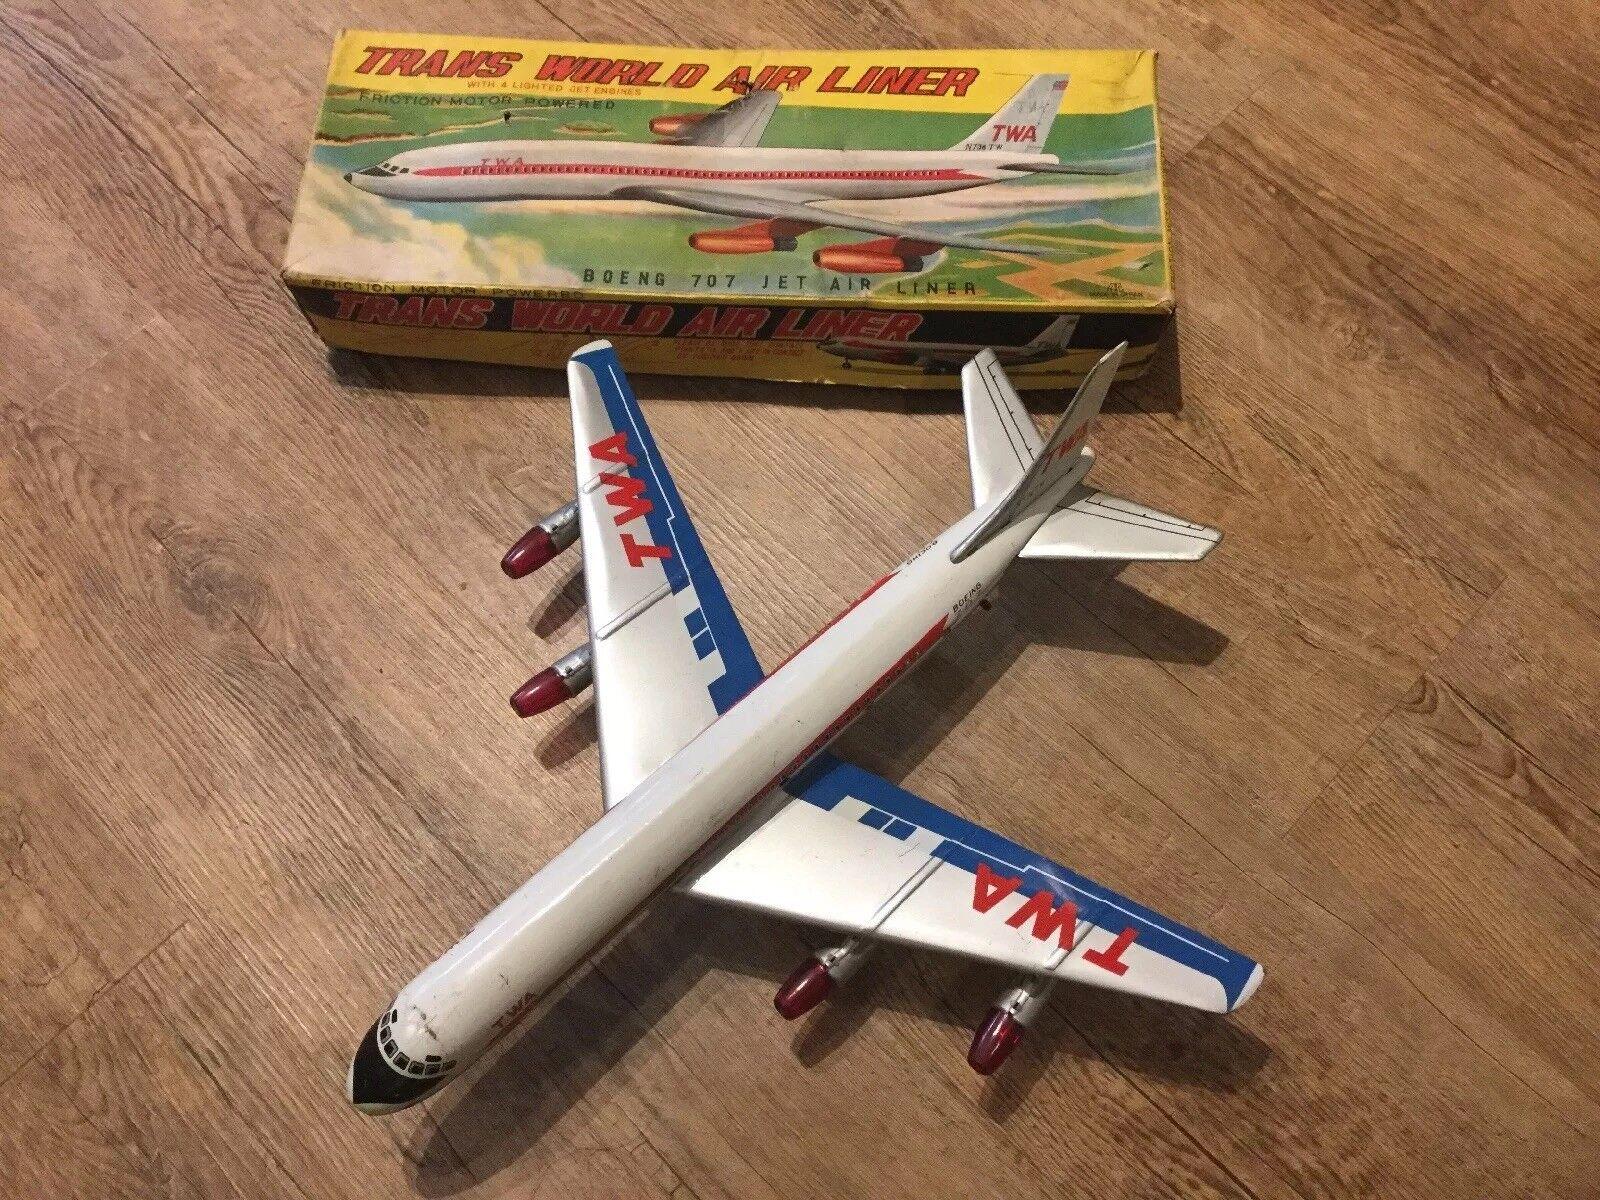 Vintage Tin Friction Powered TWA Trans World Air Liner Plane